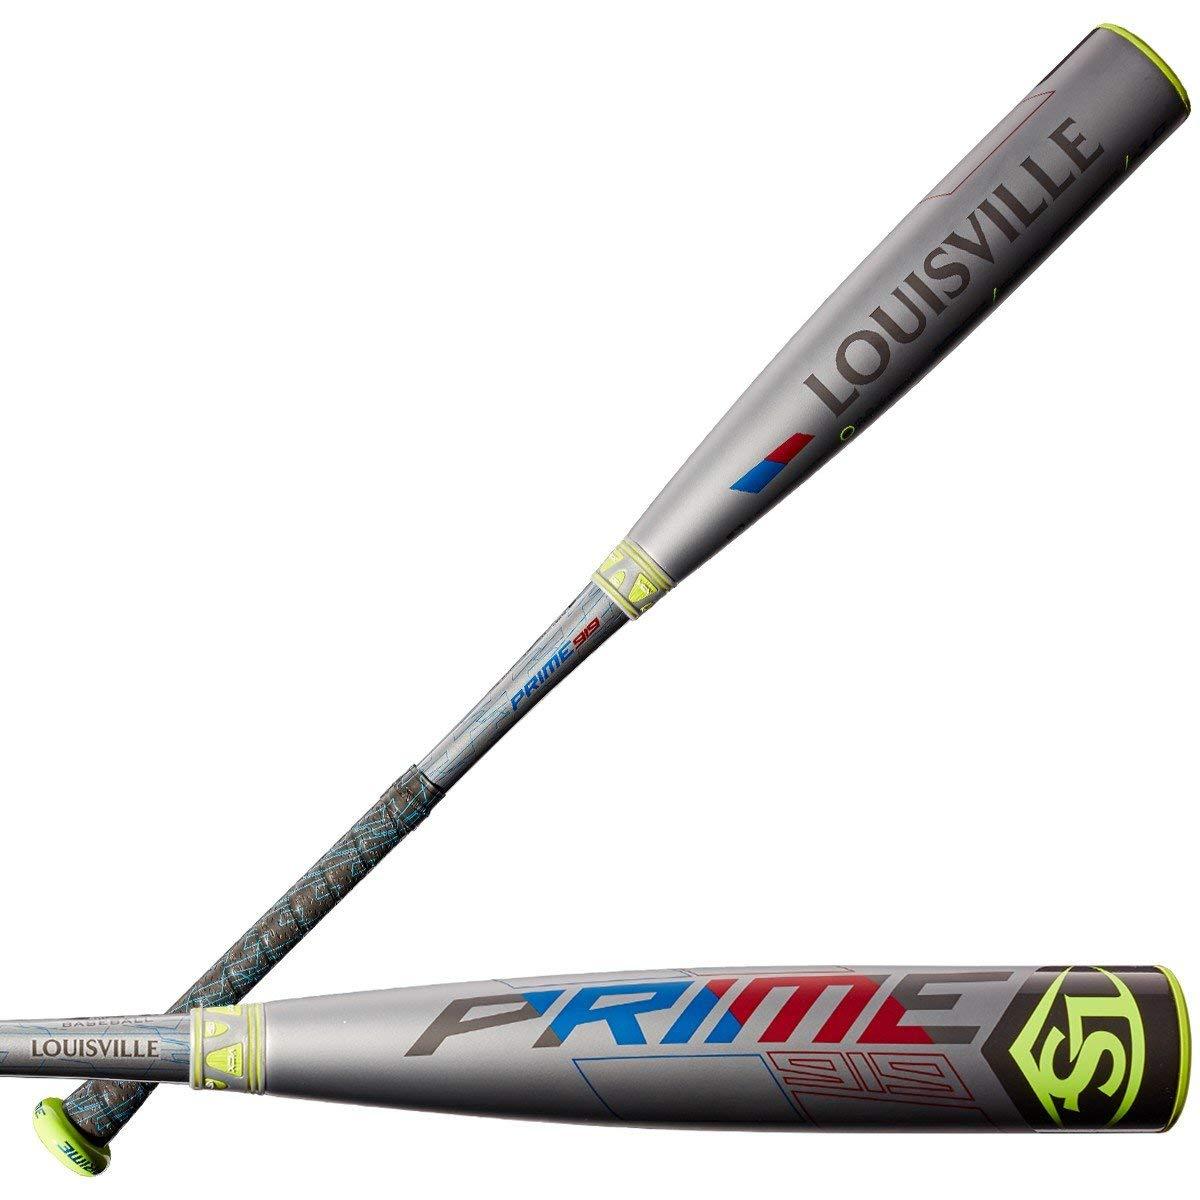 louisville-slugger-2019-prime-919-10-usa-baseball-bat-29-inch-19-oz WTLUBP919B1029 Louisville 887768730161 <p>-10 length to weight ratio 2 5/8 inch barrel diameter 2-piece